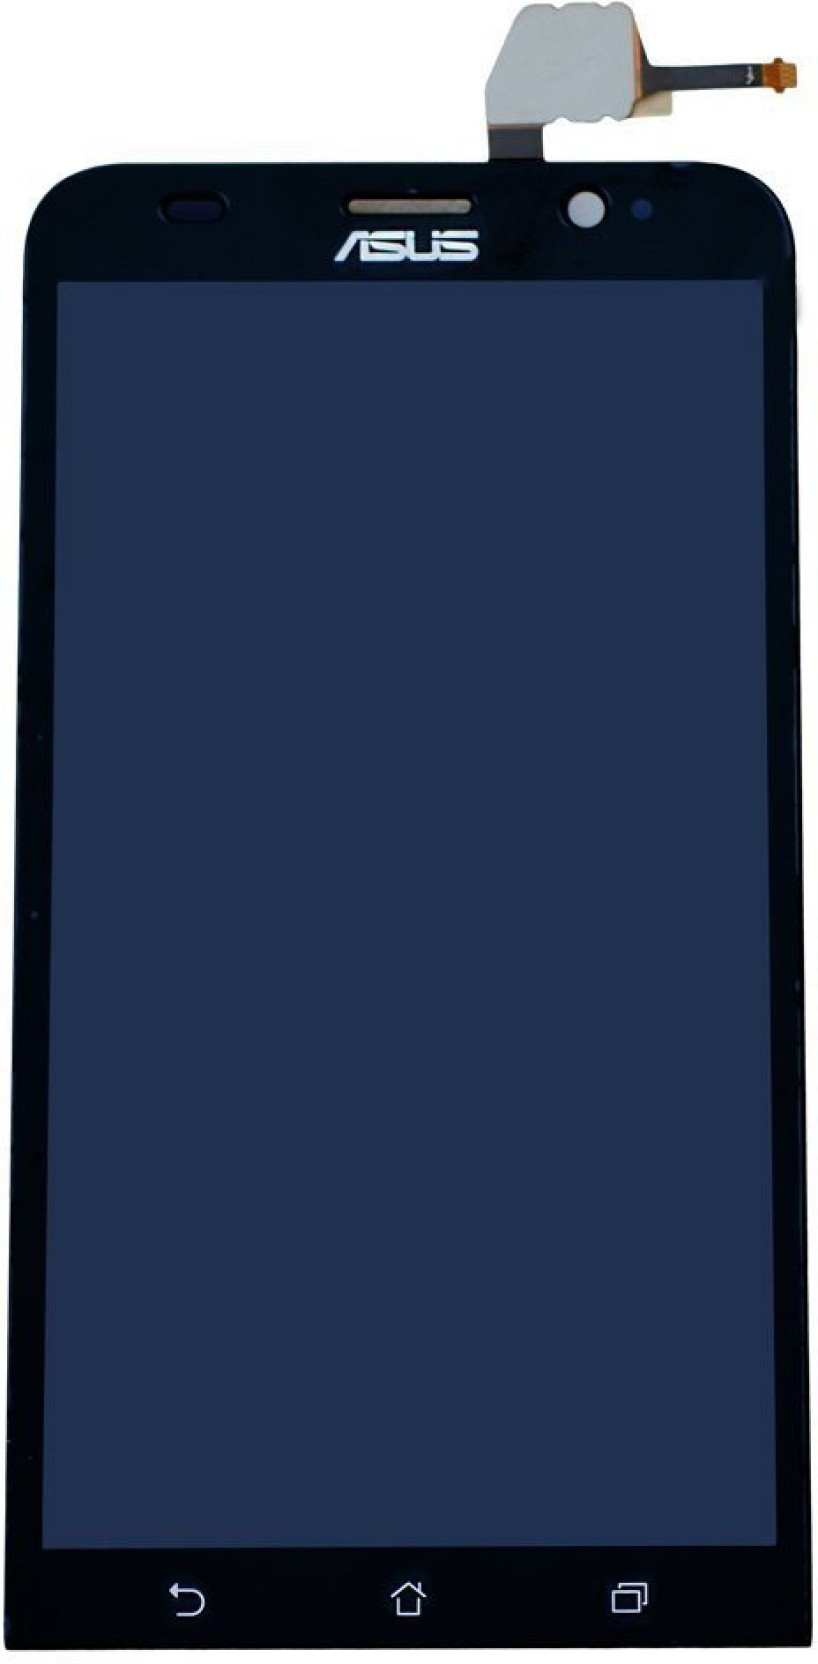 Original Gorilla Lcd Display Touch Screen Digitizer Assembly For Touchscreen Asus Zenfone 6 2 Ze550ml 55 Home